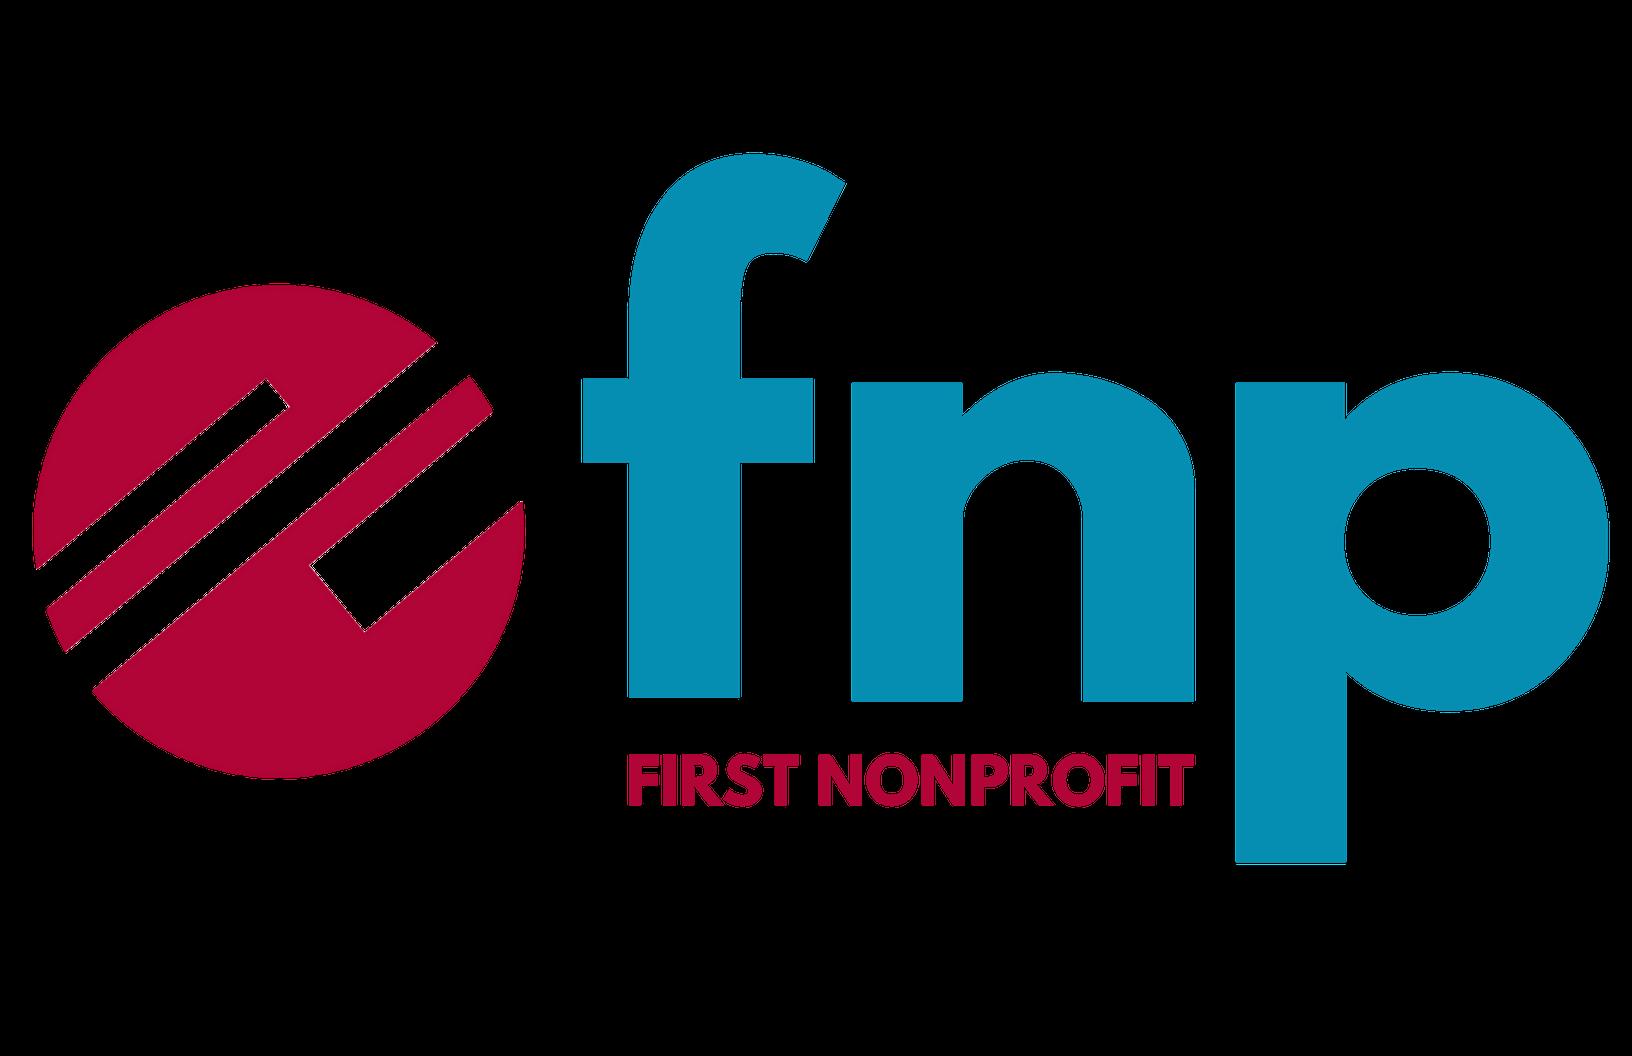 FNP 2018 LOGO (1)